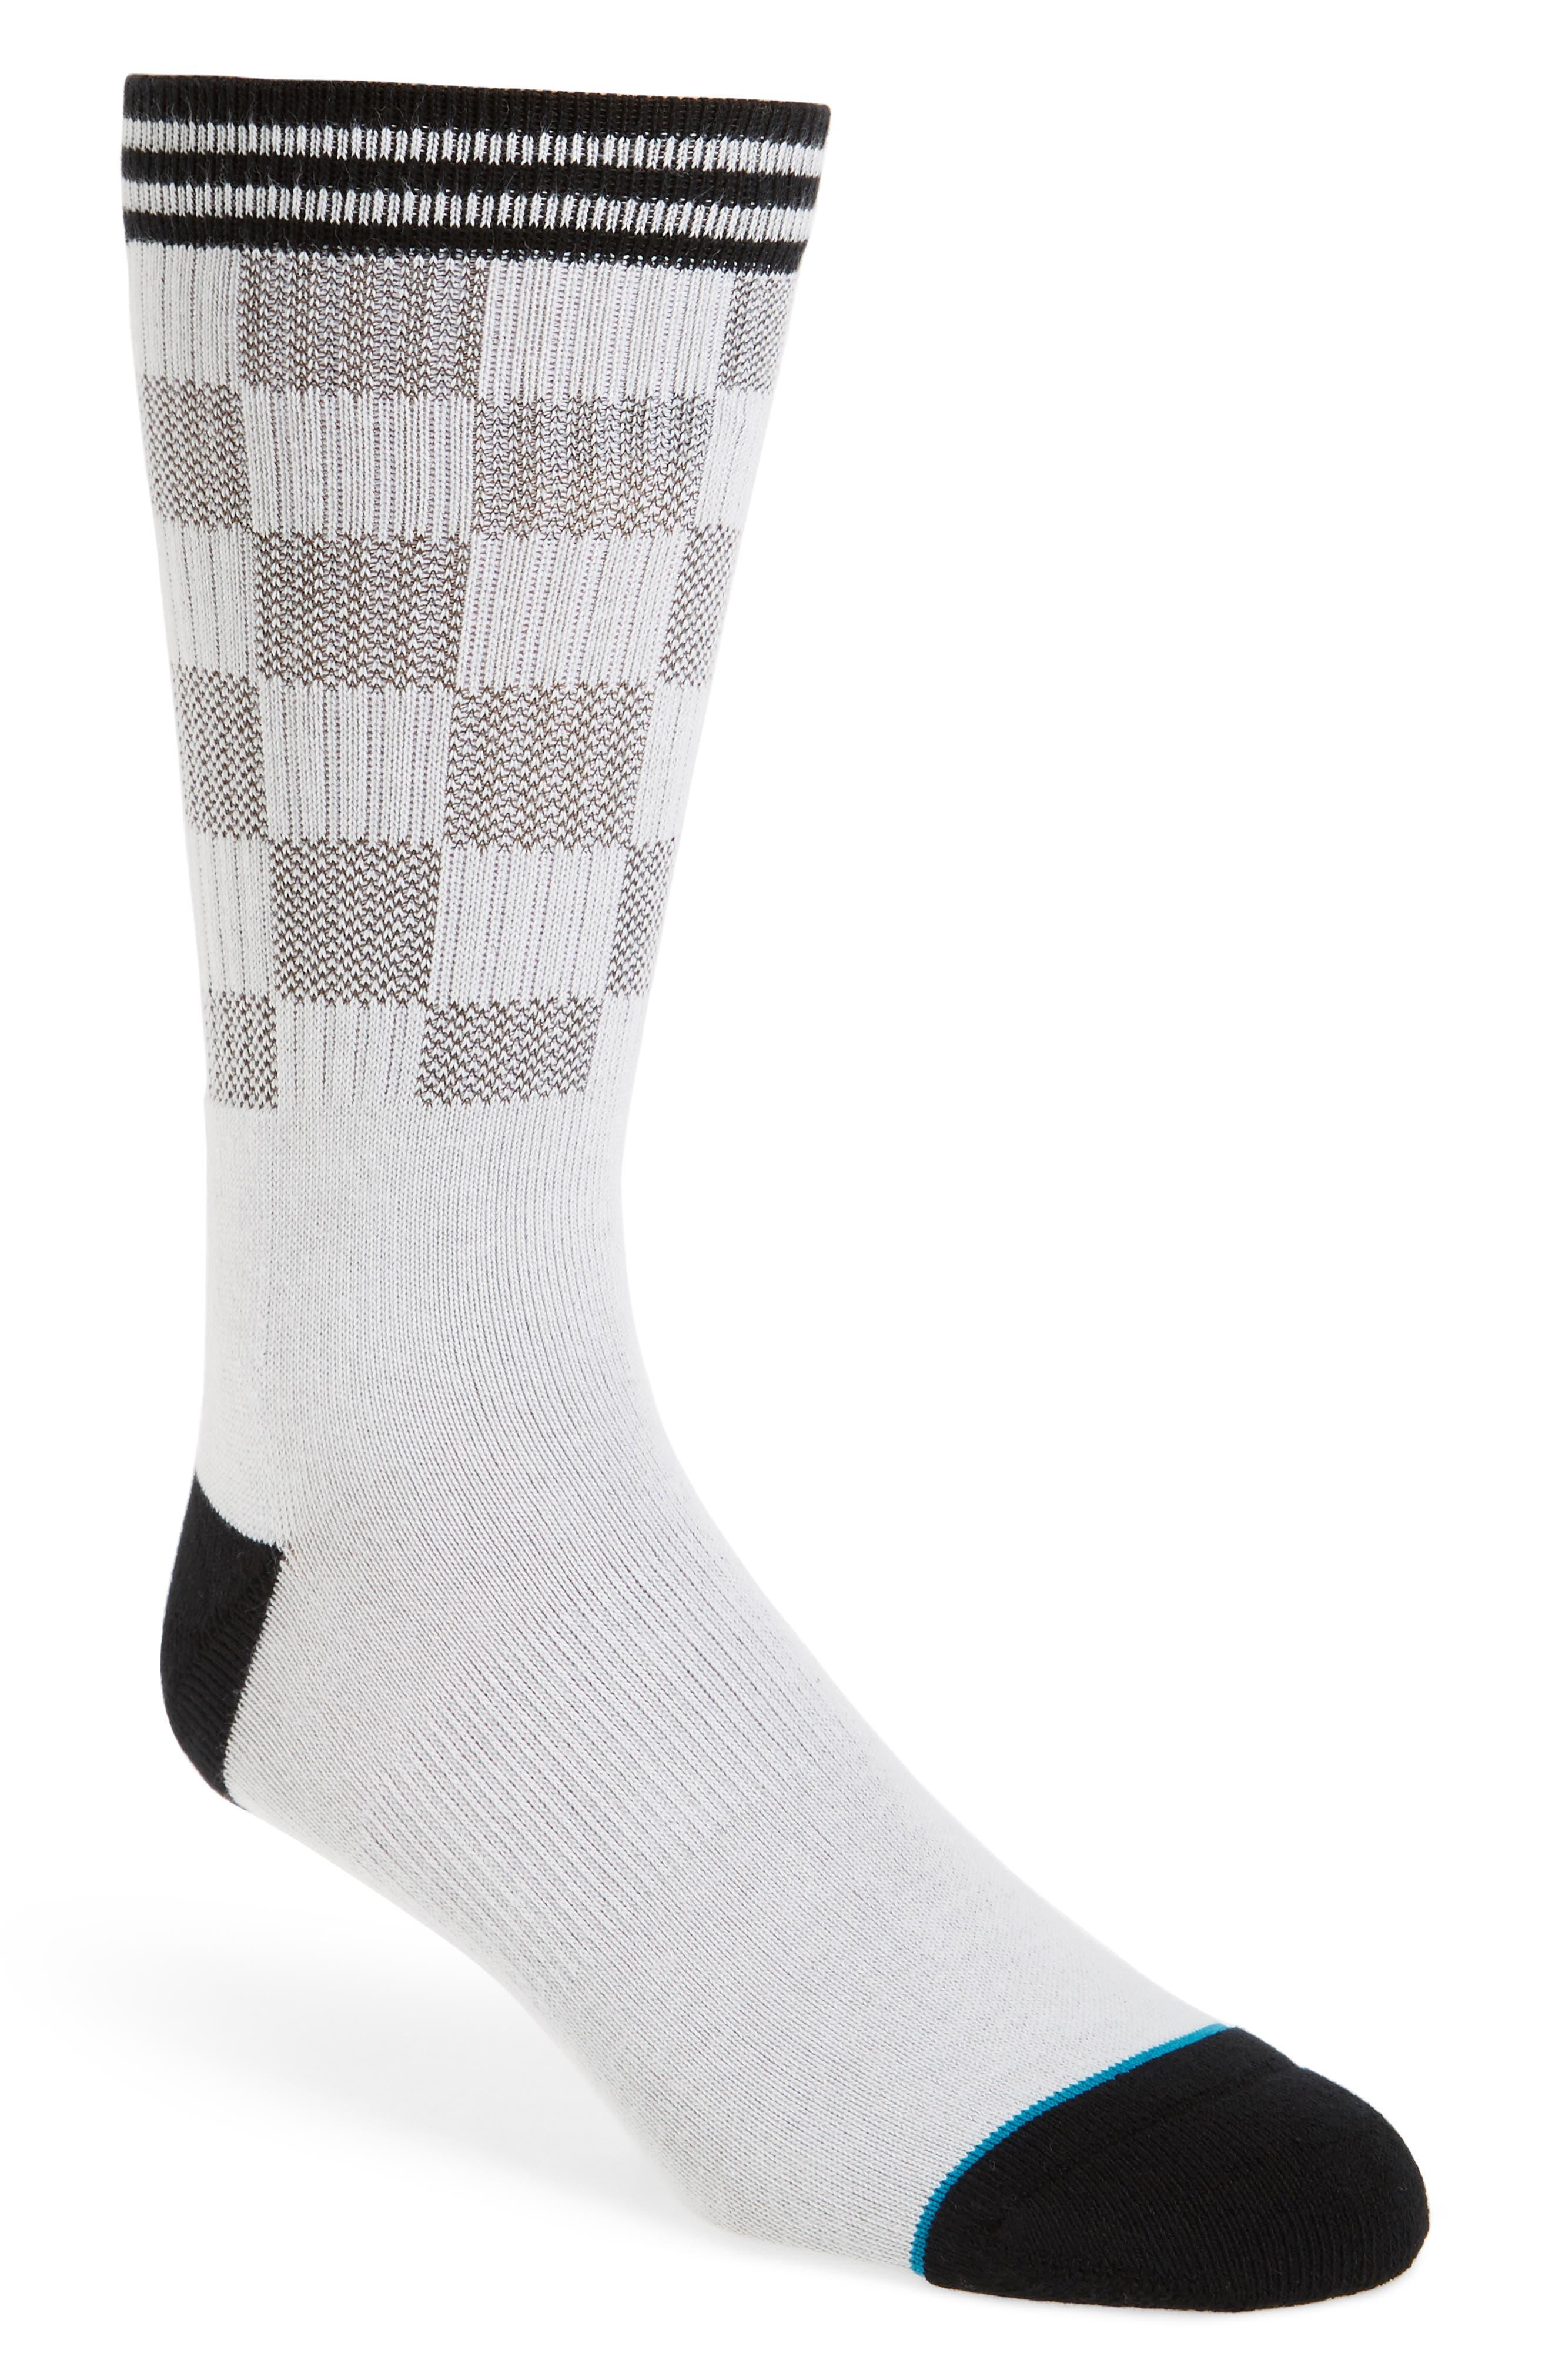 Caged Socks,                         Main,                         color, WHITE